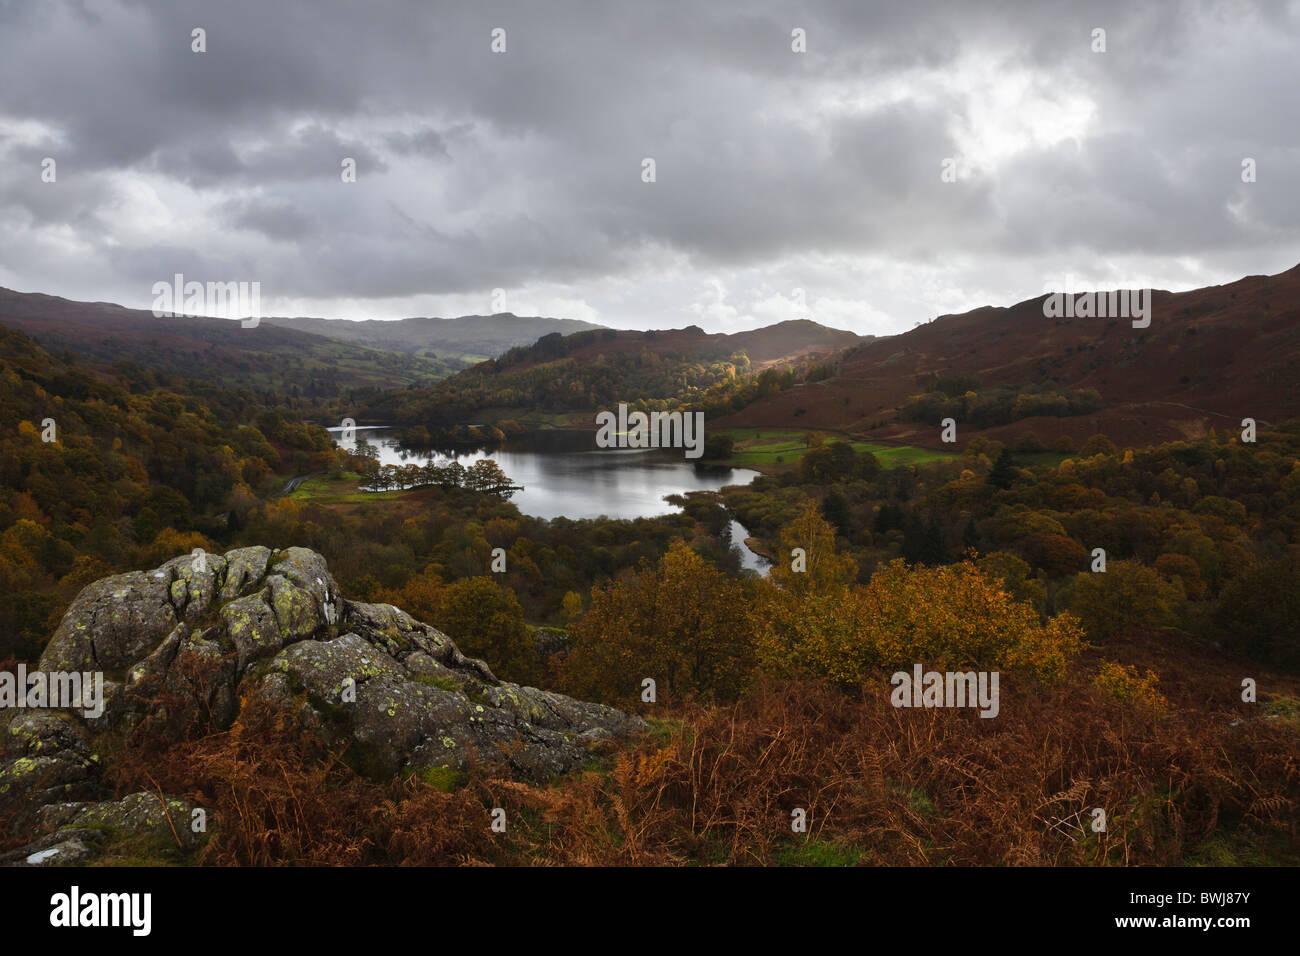 Rydal Water de musgo blanco común, Lake District National Park, Cumbria, Inglaterra Imagen De Stock